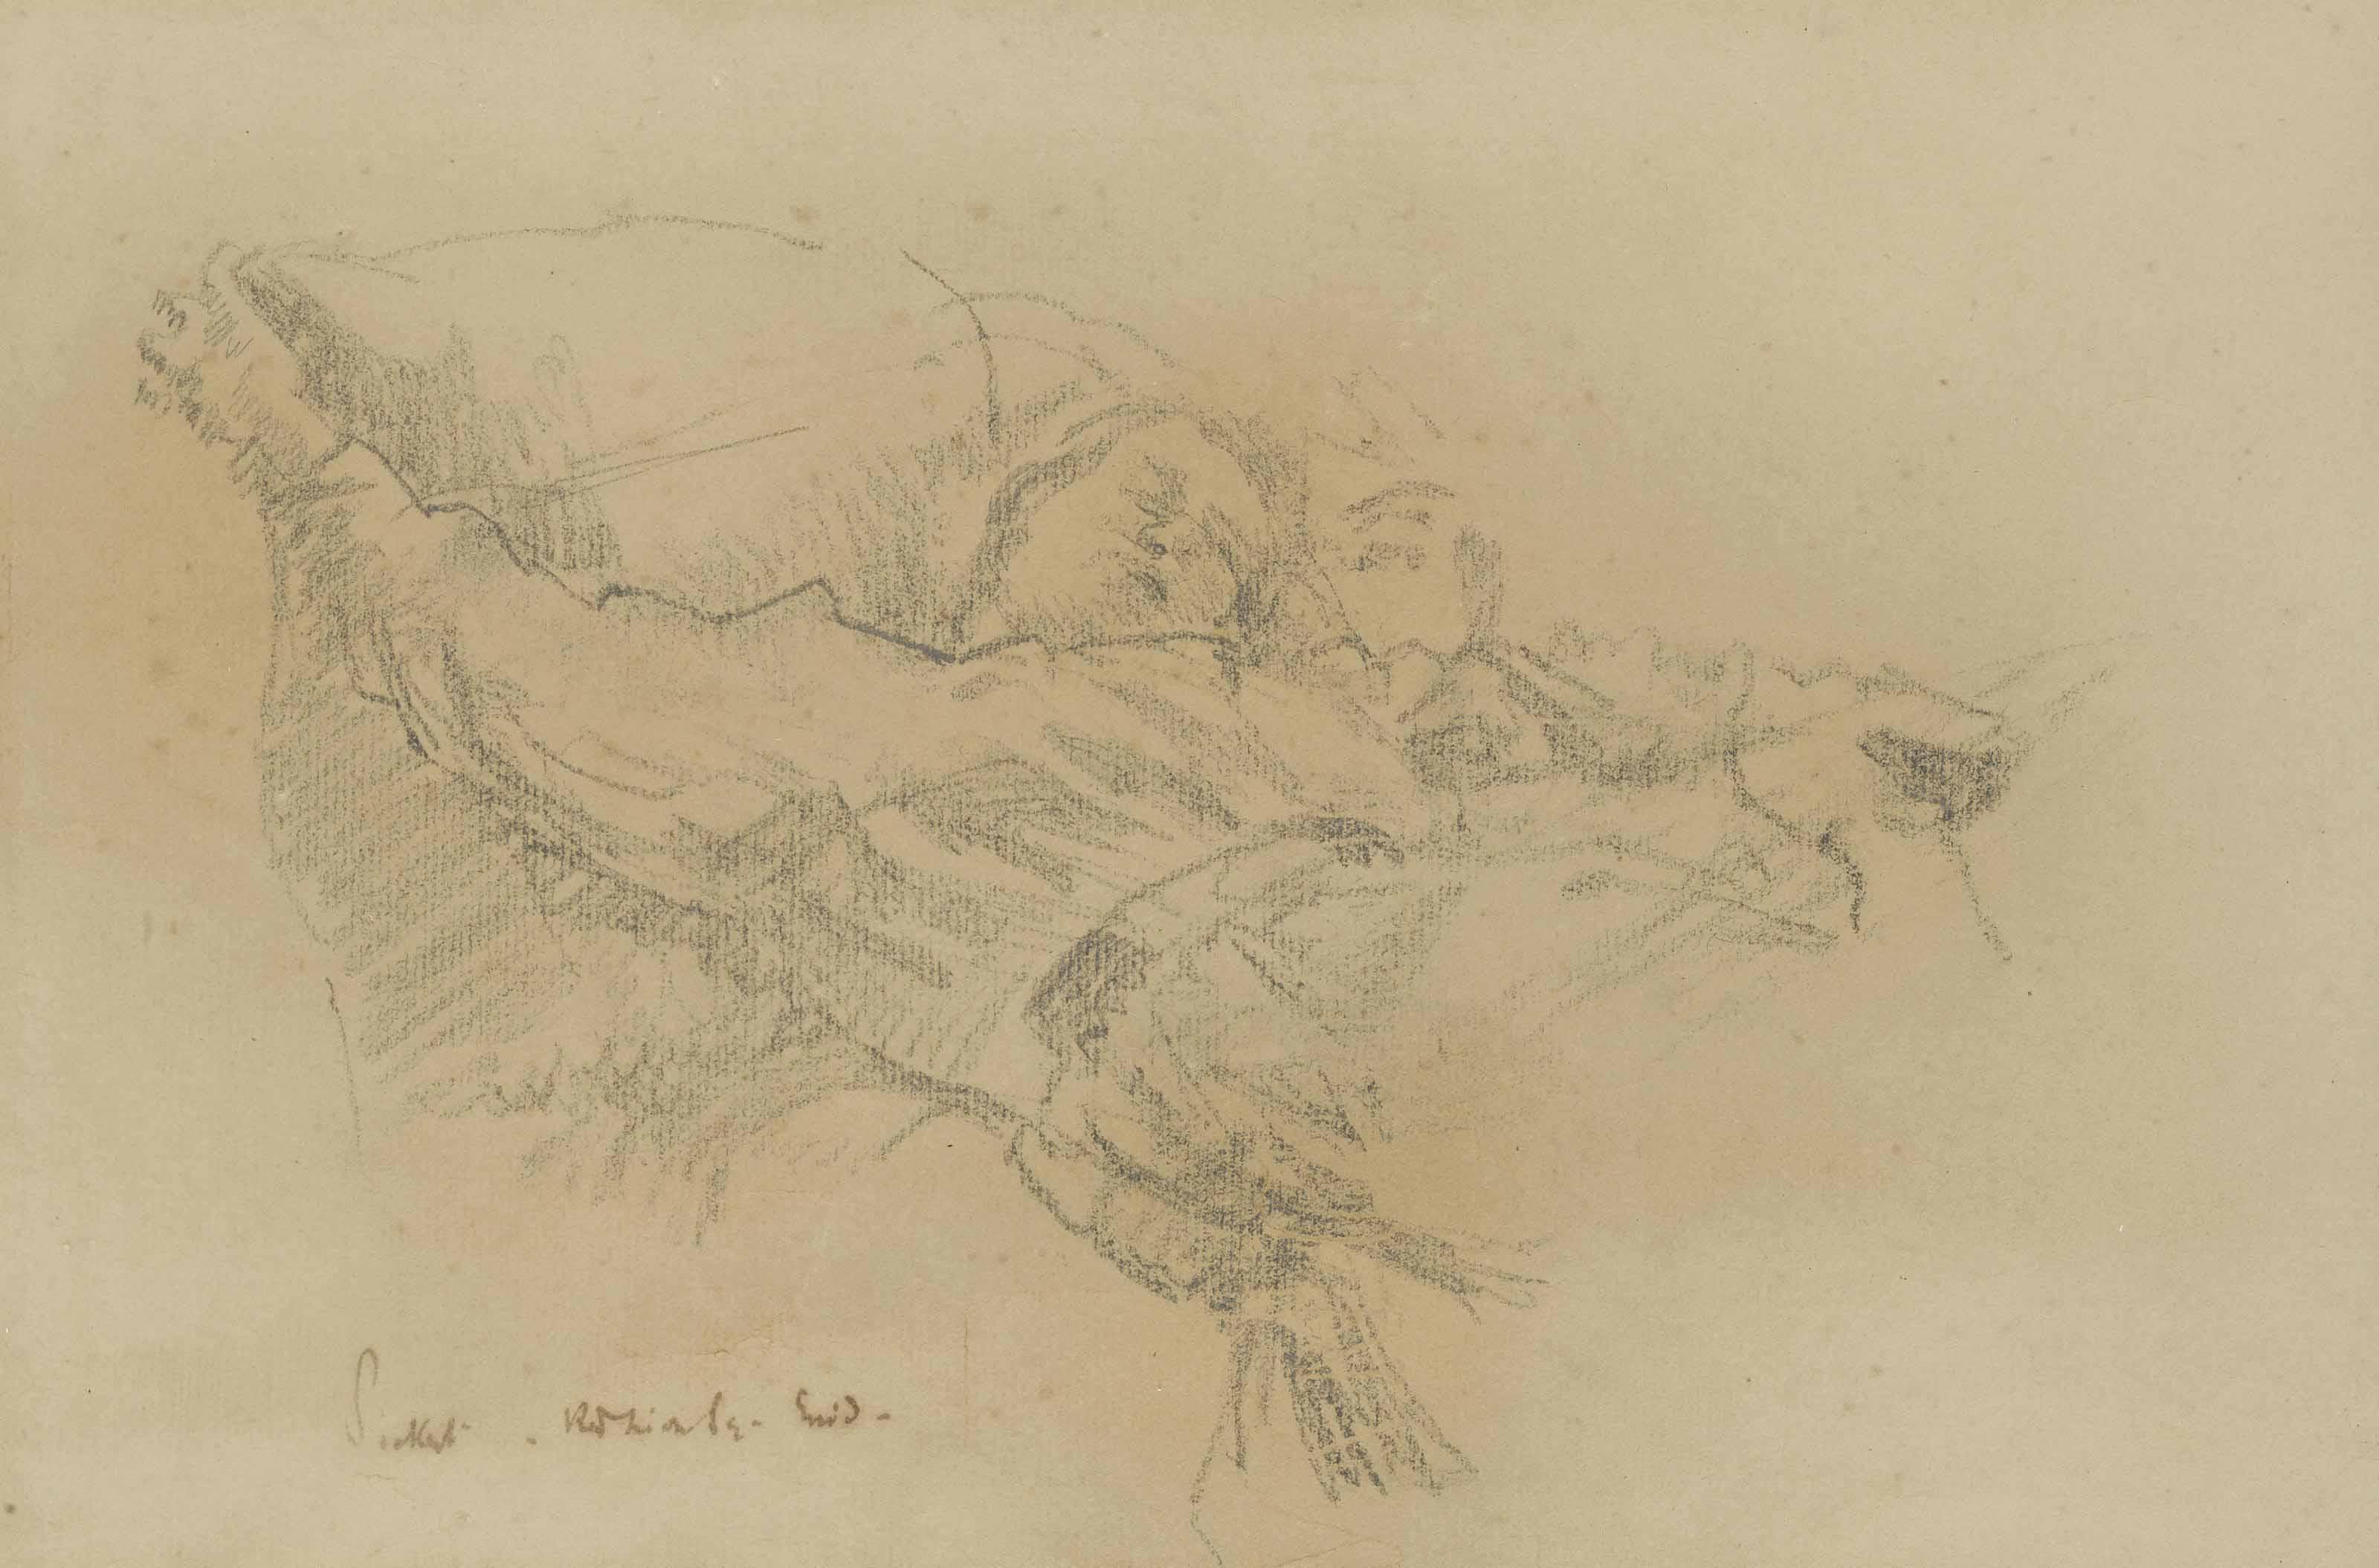 Walter Richard Sickert A R A 1860 1942 Enid Bagnold